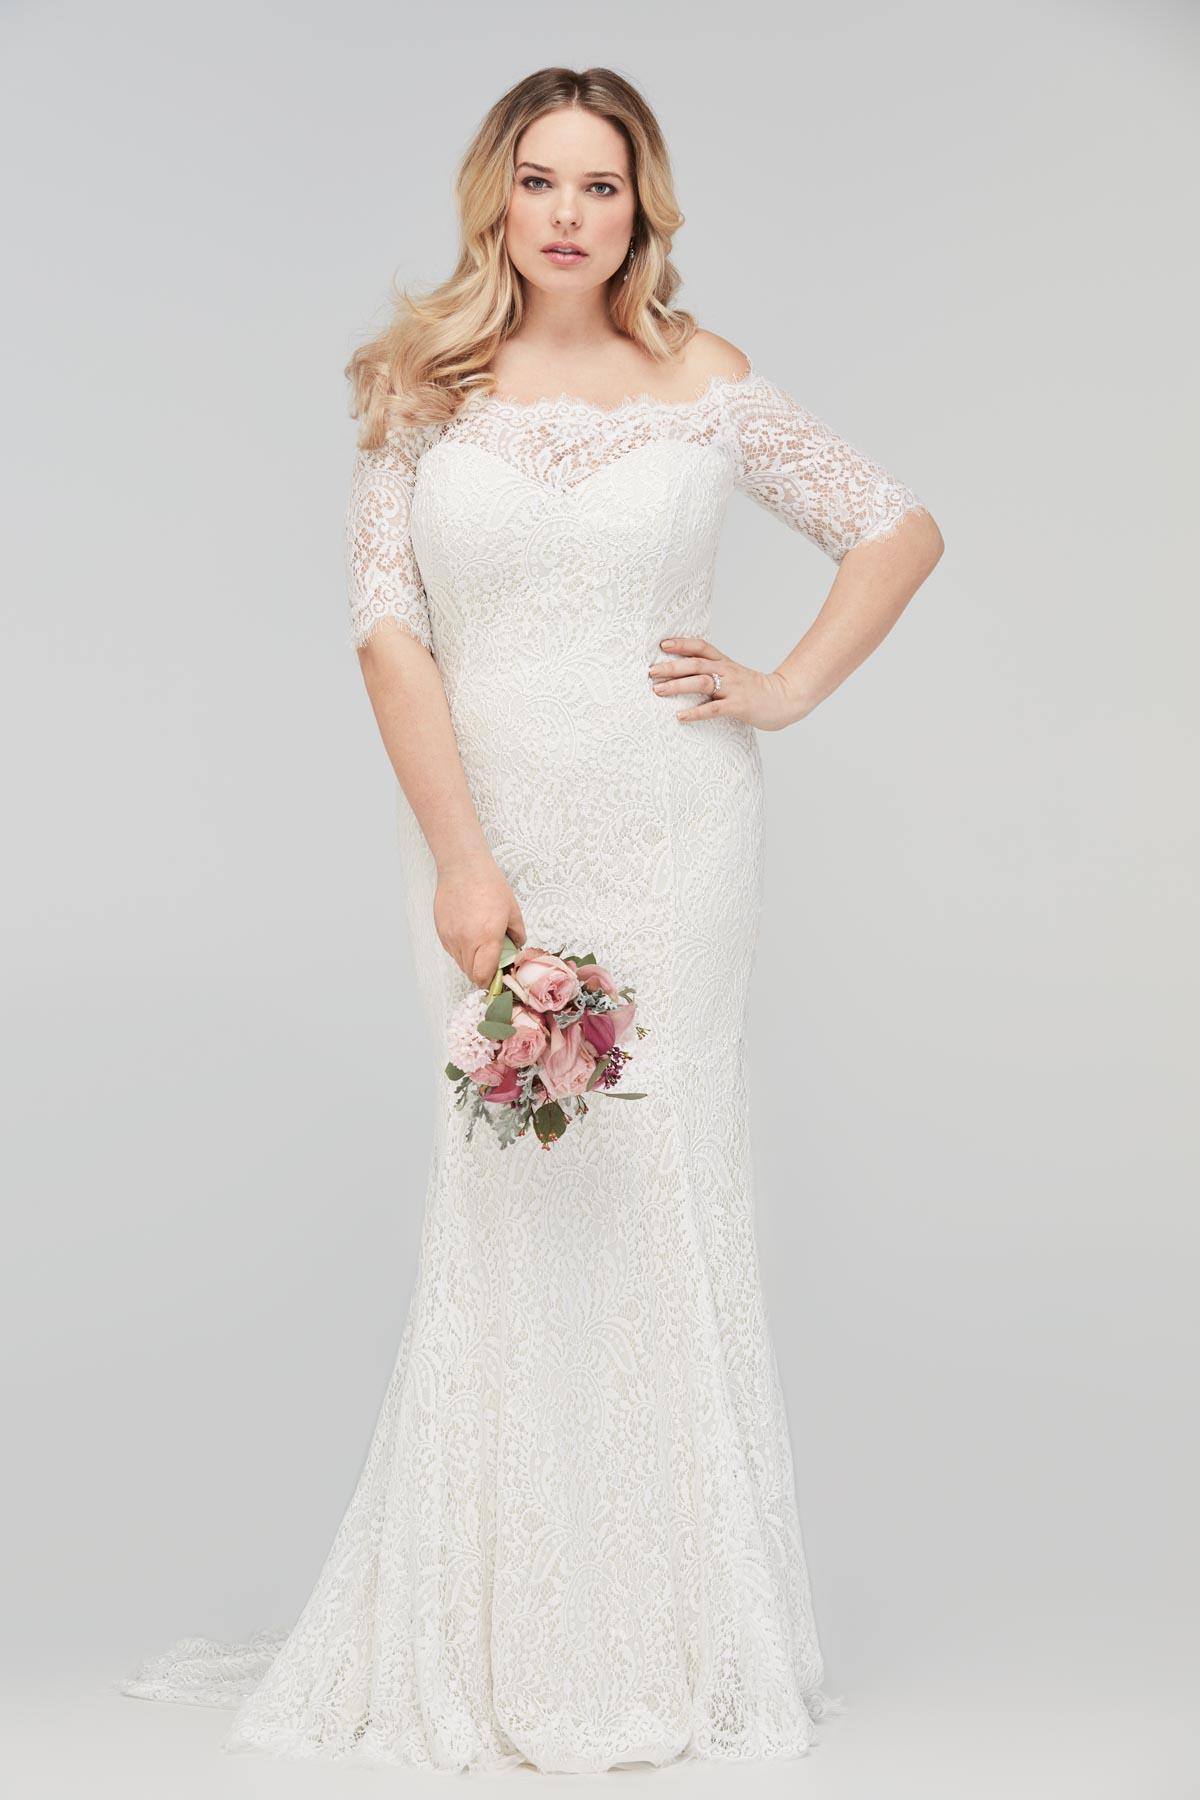 Plus Size Wedding Dresses Inspired By Meghan Markle\'s Royal Wedding ...